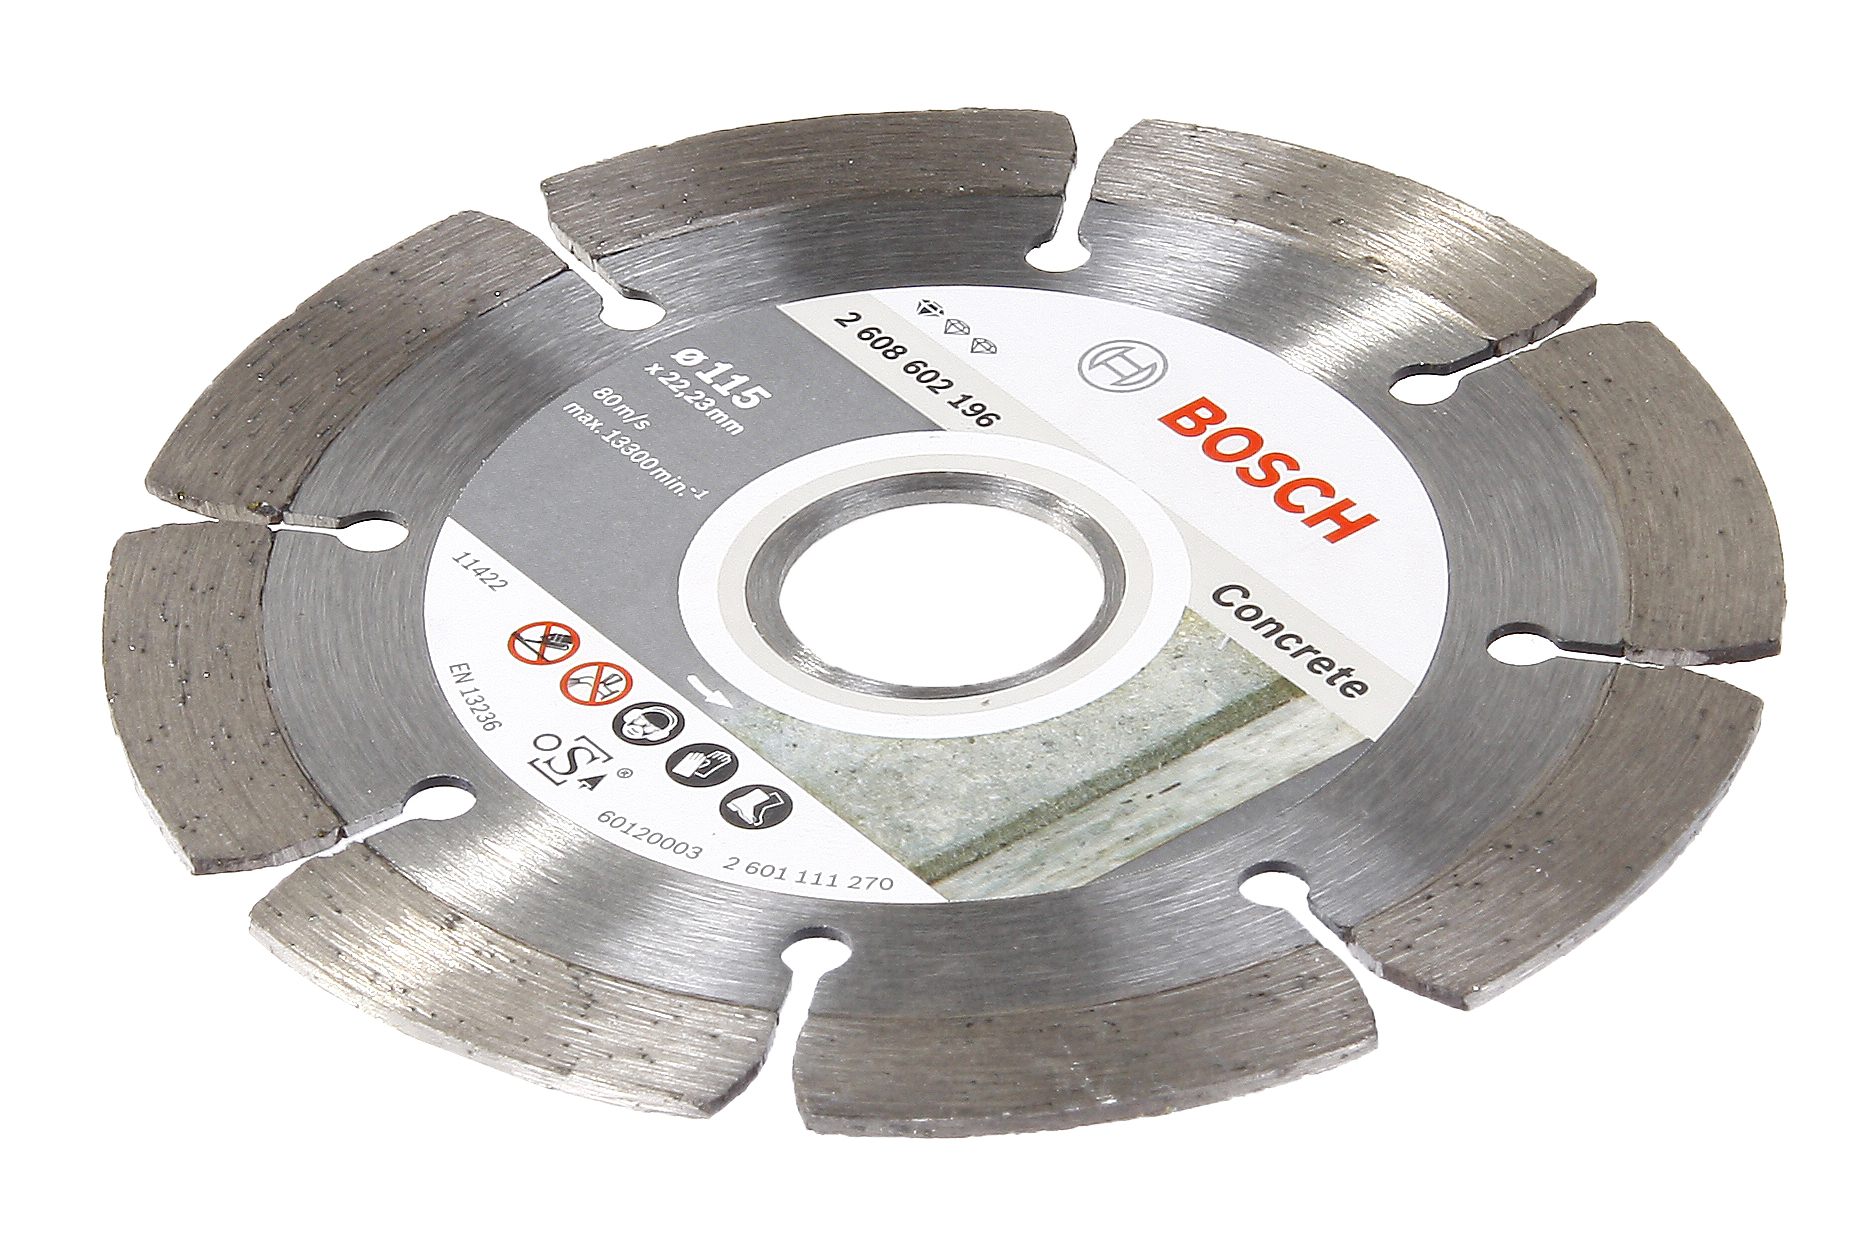 Фото 2/2 Standard for concrete 150 Х 22,2 сегмент, Круг алмазный